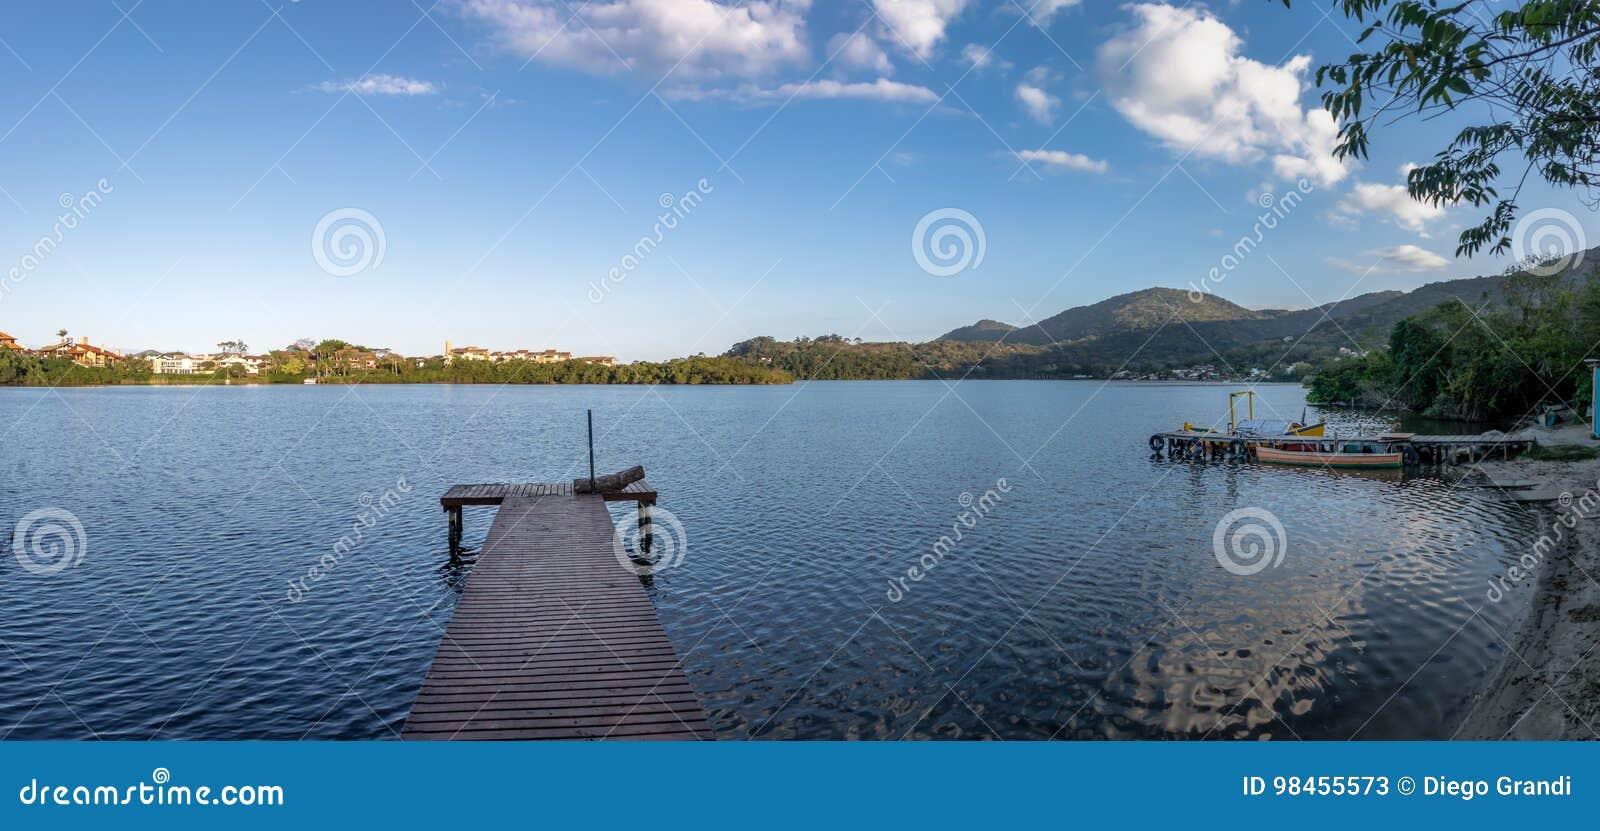 Panoramic view of Canto da Lagoa area of Lagoa da Conceicao - Florianopolis, Santa Catarina, Brazil